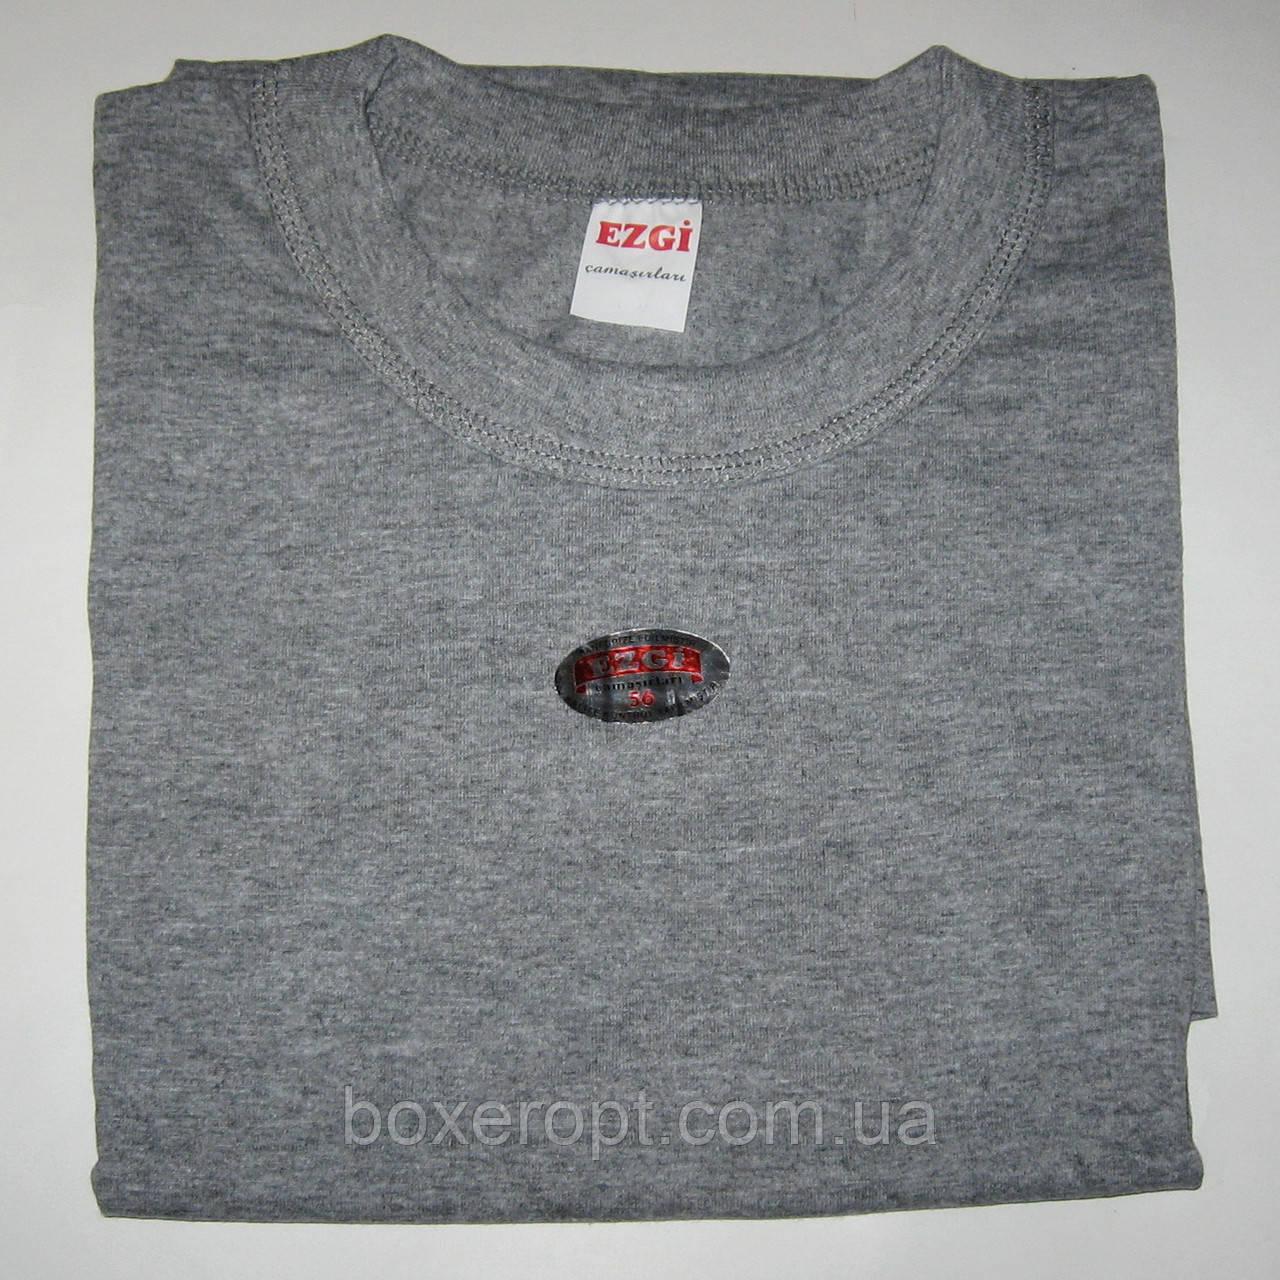 Мужские футболки Ezgi - 46.00 грн./шт. (70-й размер, серые)